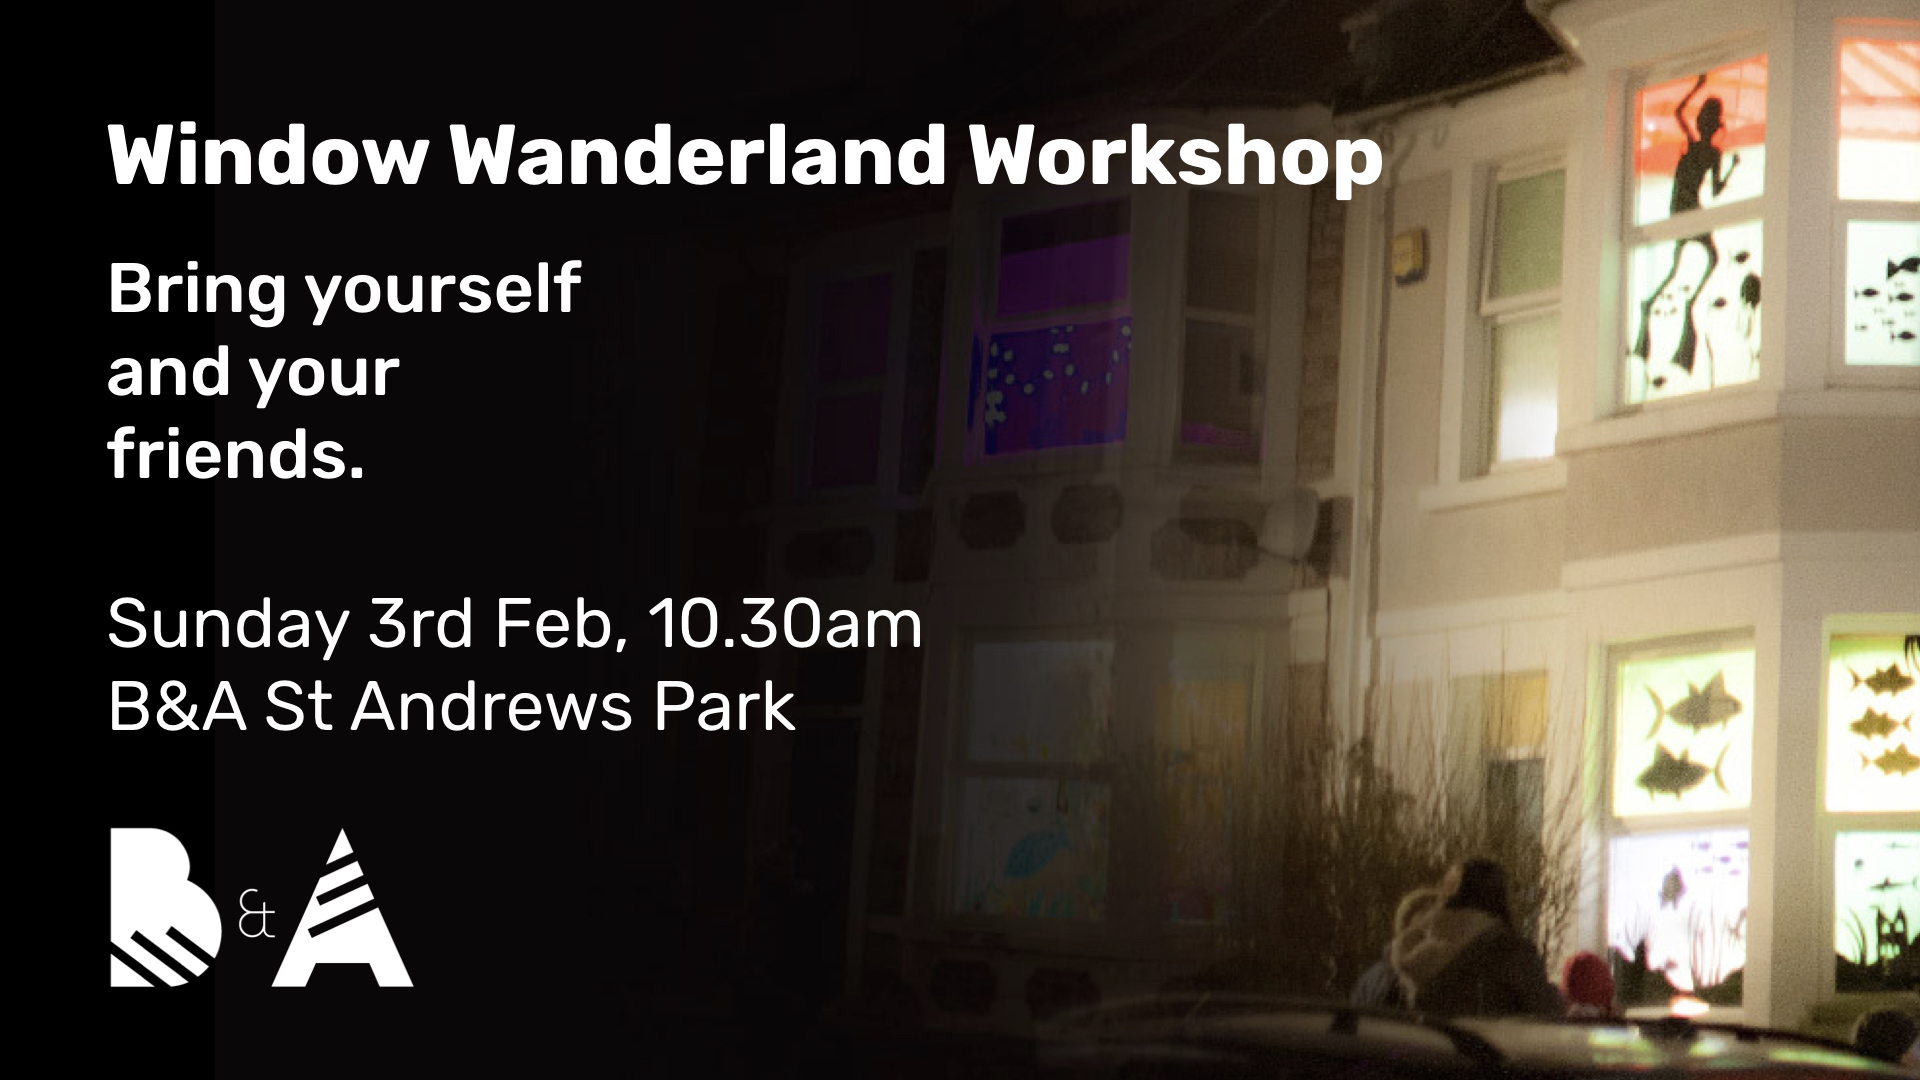 Window Wanderland Workshop.001.jpeg